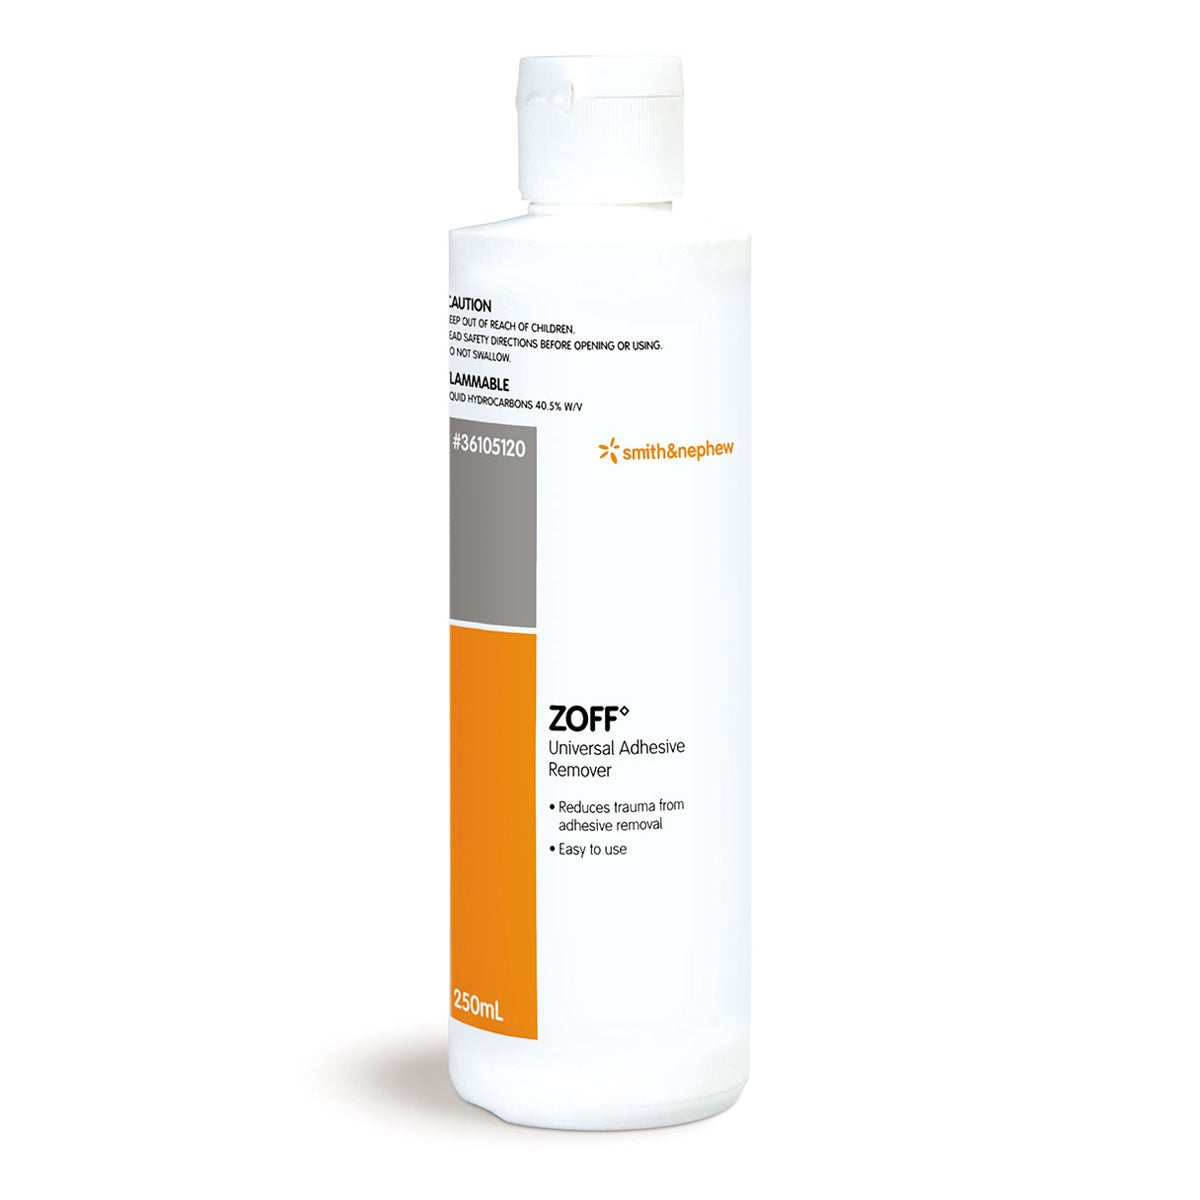 Smith & Nephew ZOFF Universal Adhesive Remover 250ml